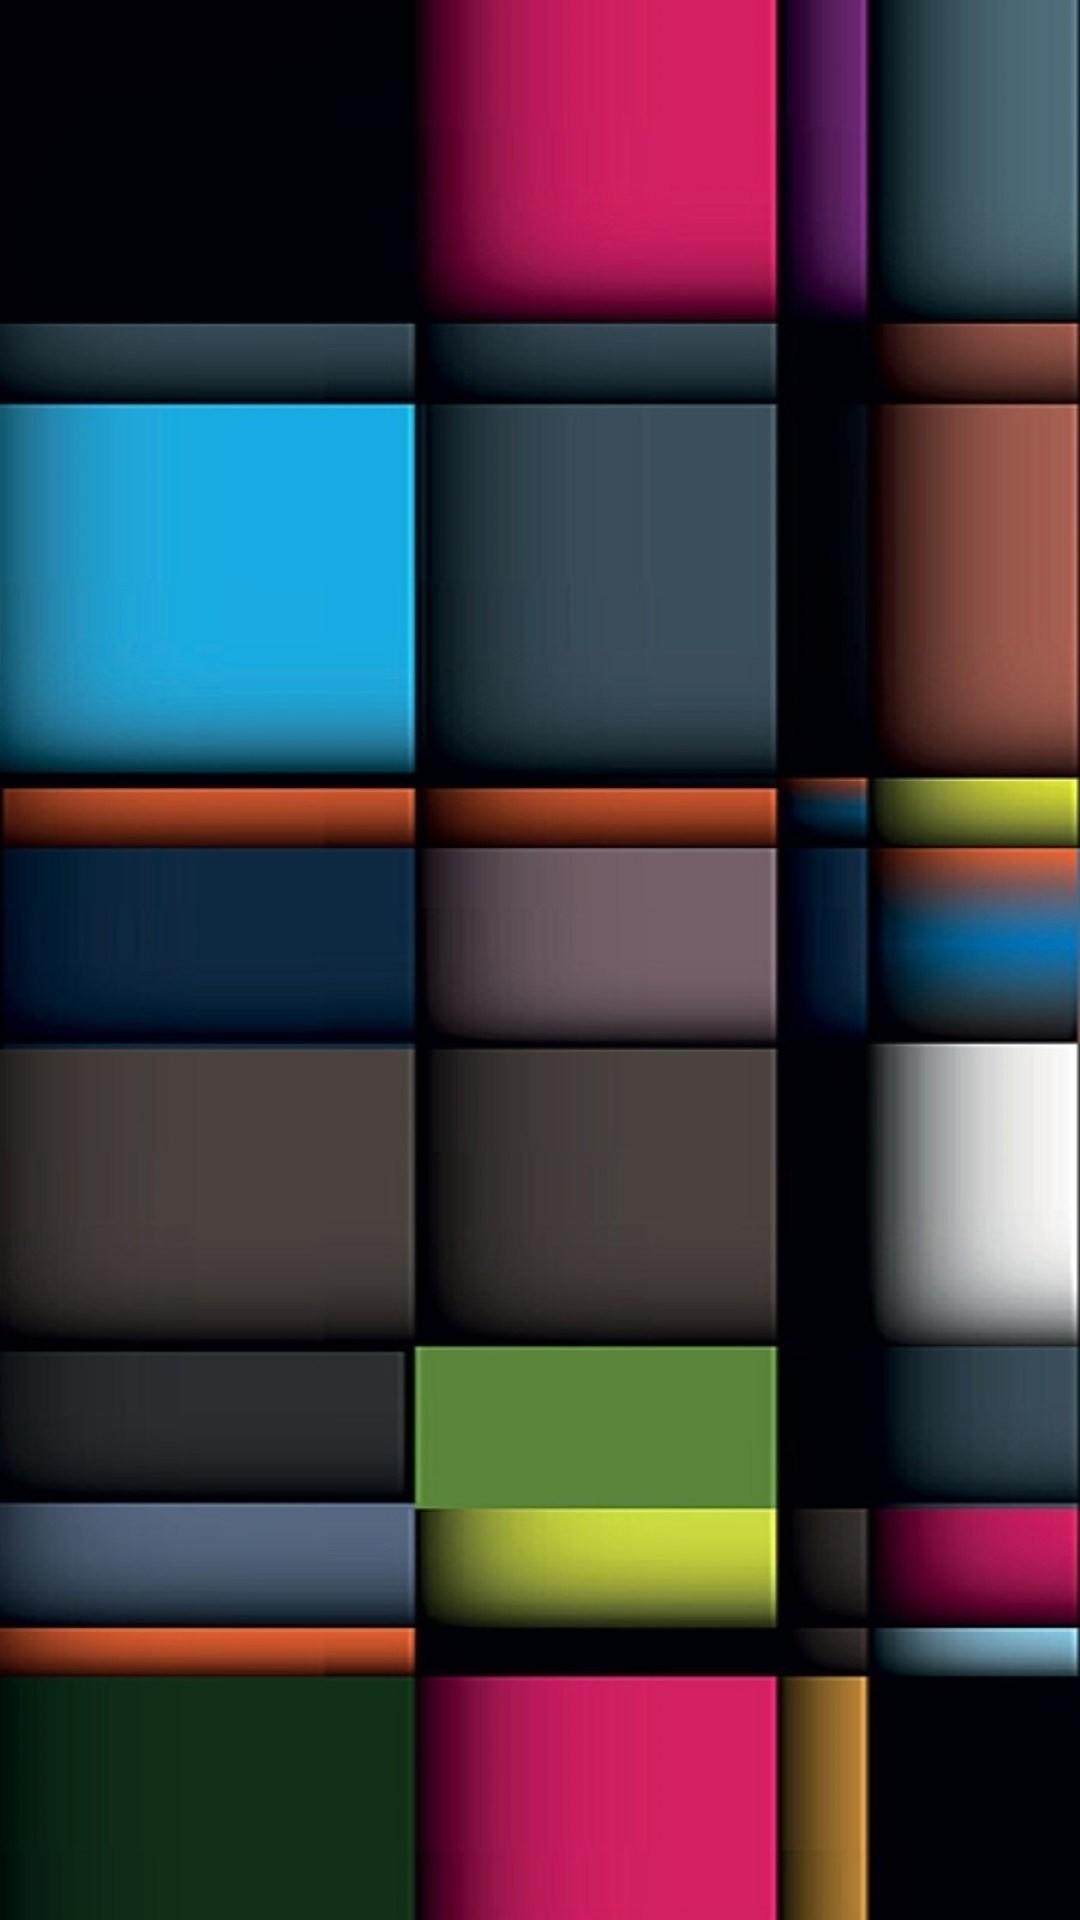 Free download wallpaper 1080x1920 4658 528392840[1] BlackBerry Z10